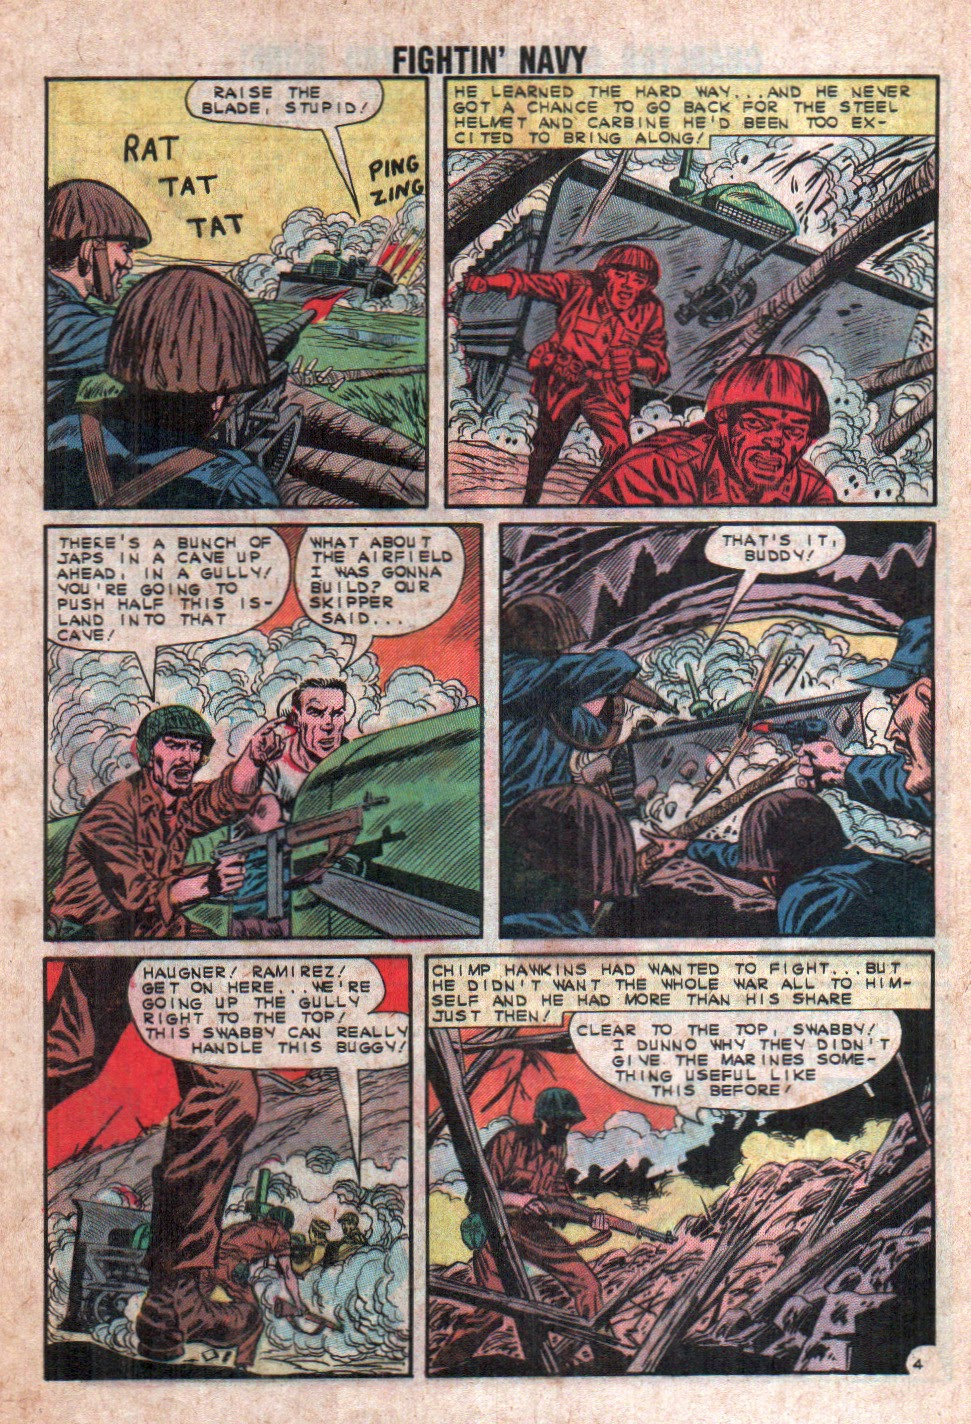 Read online Fightin' Navy comic -  Issue #108 - 28